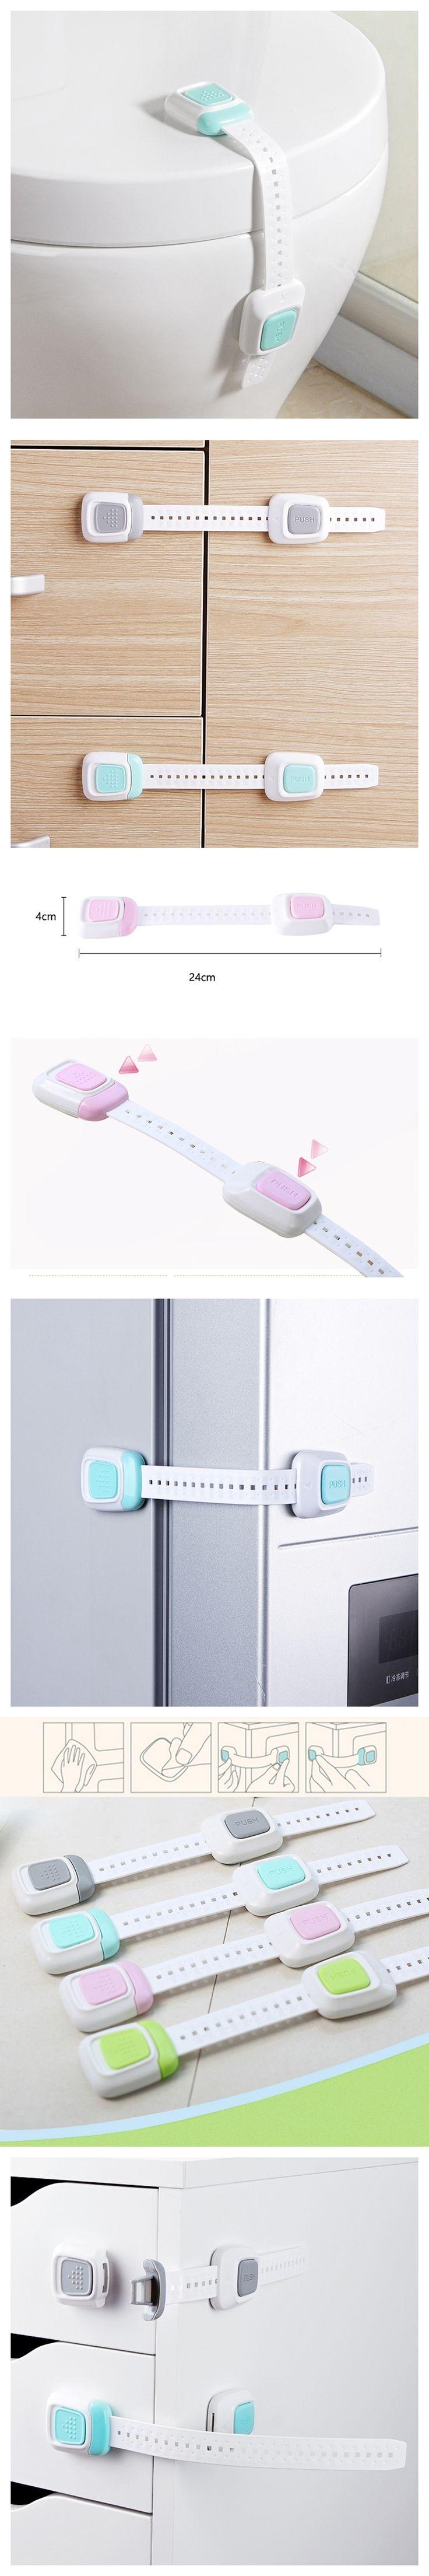 8Pcs Multi-function Double Button Children's Security Lock Baby Protective Equipment Anti-folder Hand Refrigerator Lock